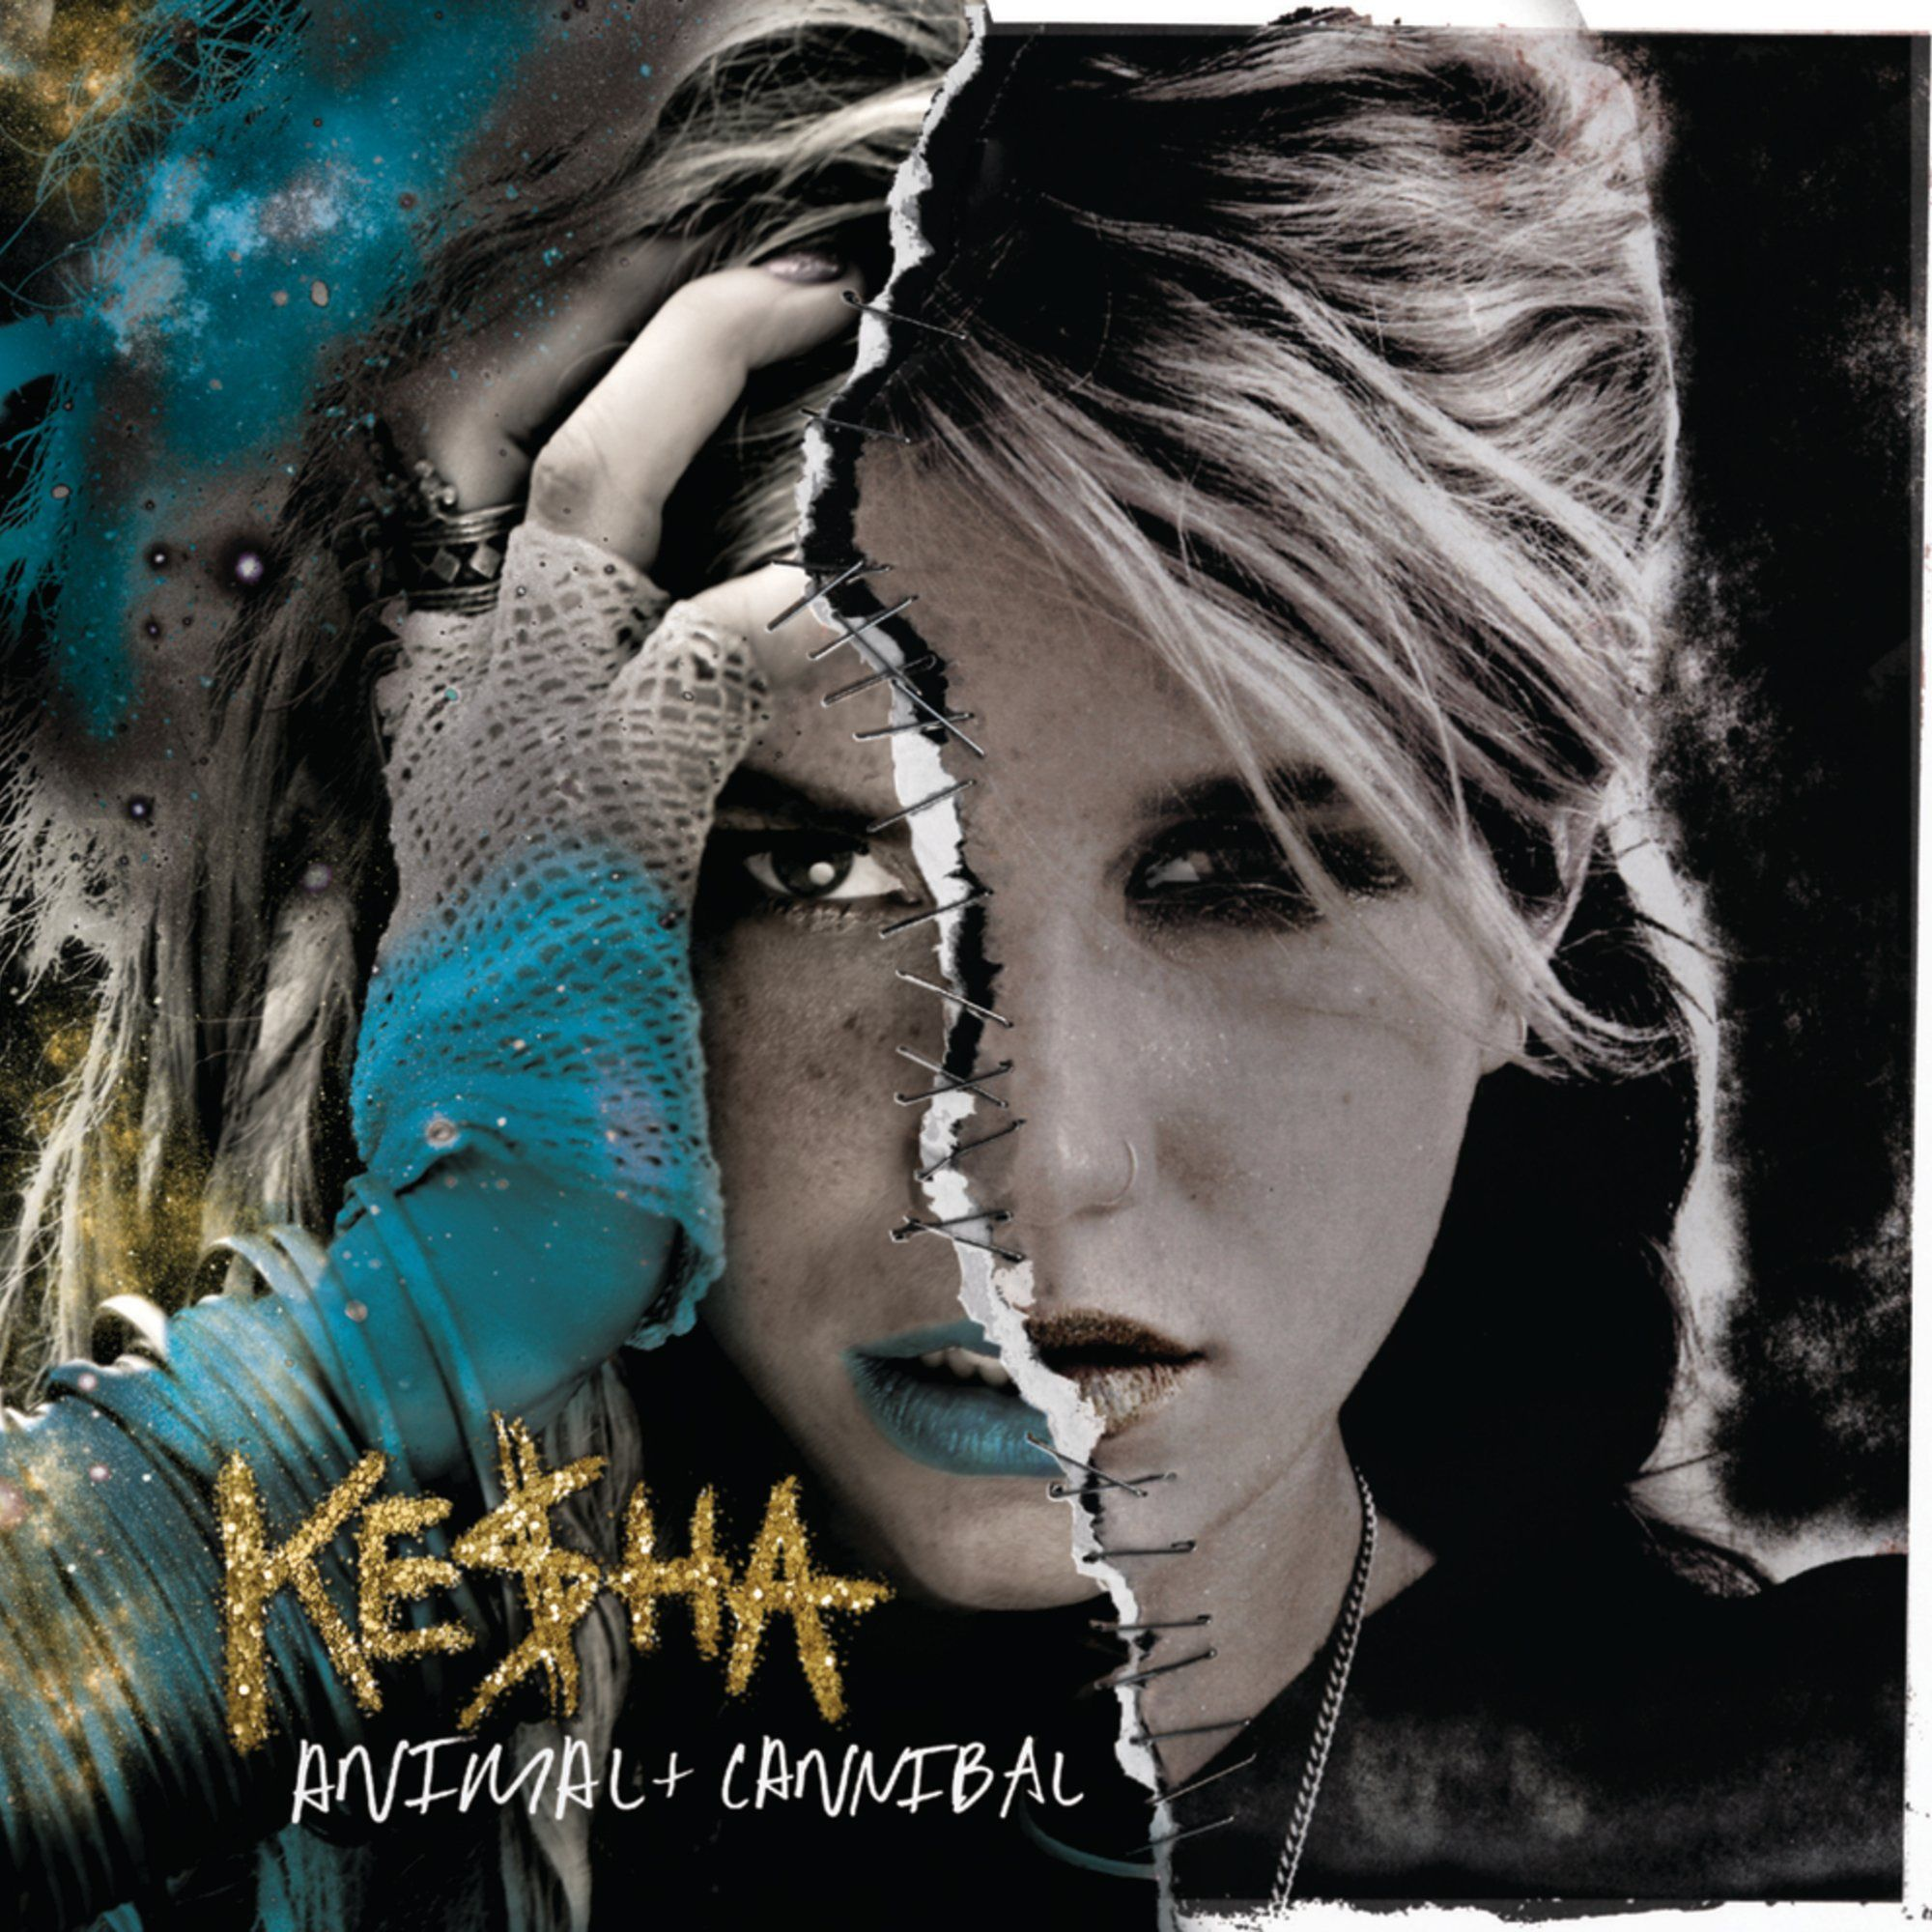 Ke$ha - Animal + Cannibal album cover